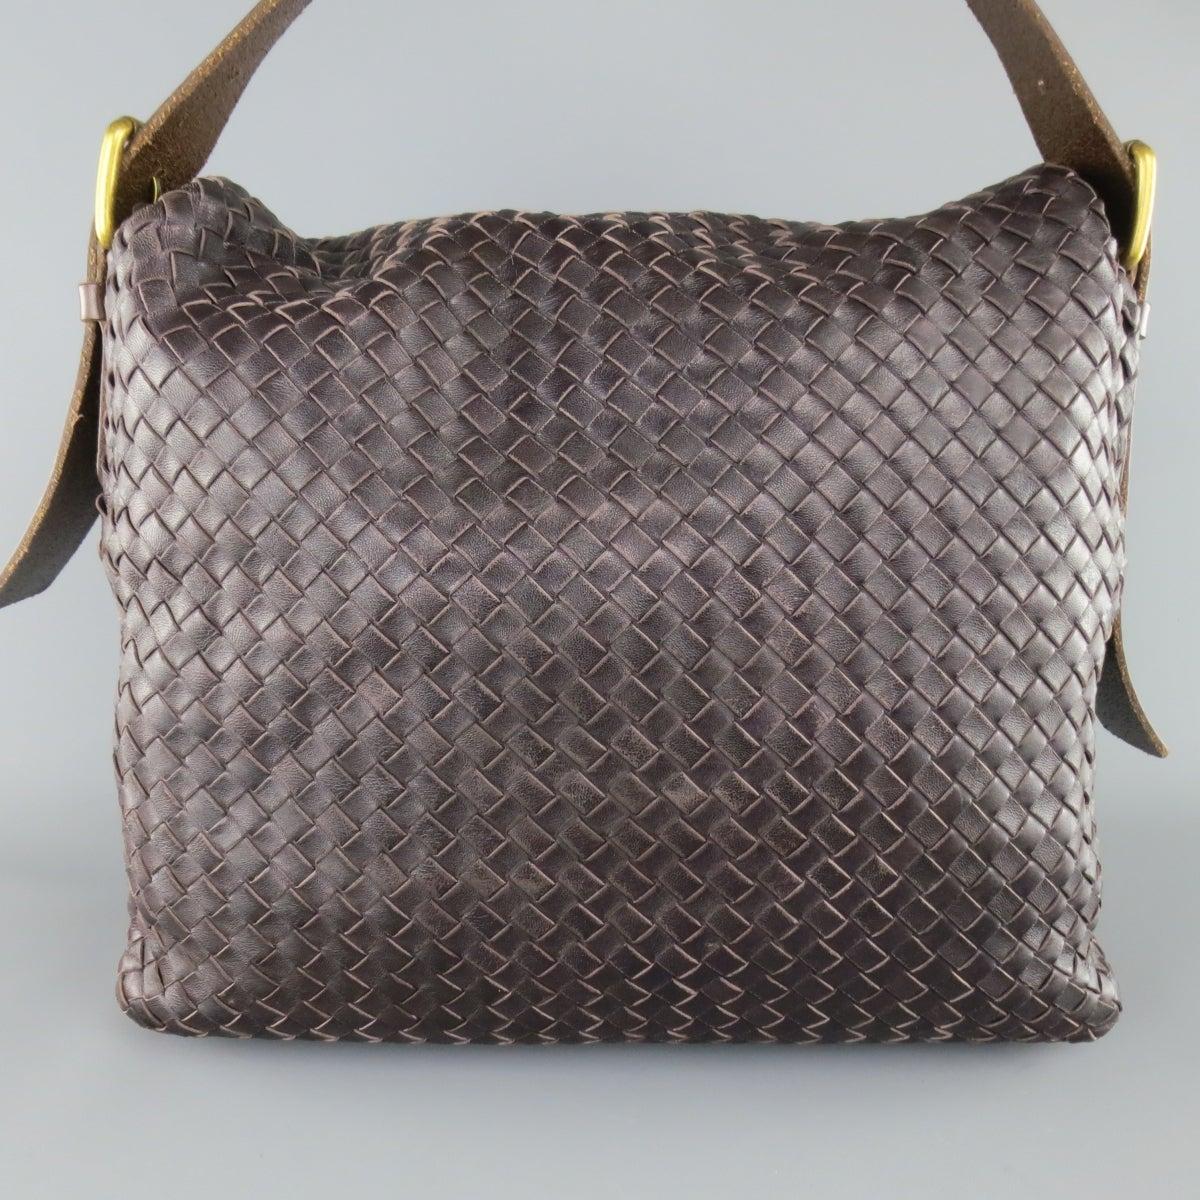 1036246ae3 BOTTEGA VENETA Bag Eggplant Intrecciato Woven Leather Brown Belt Strap  Messenger at 1stdibs